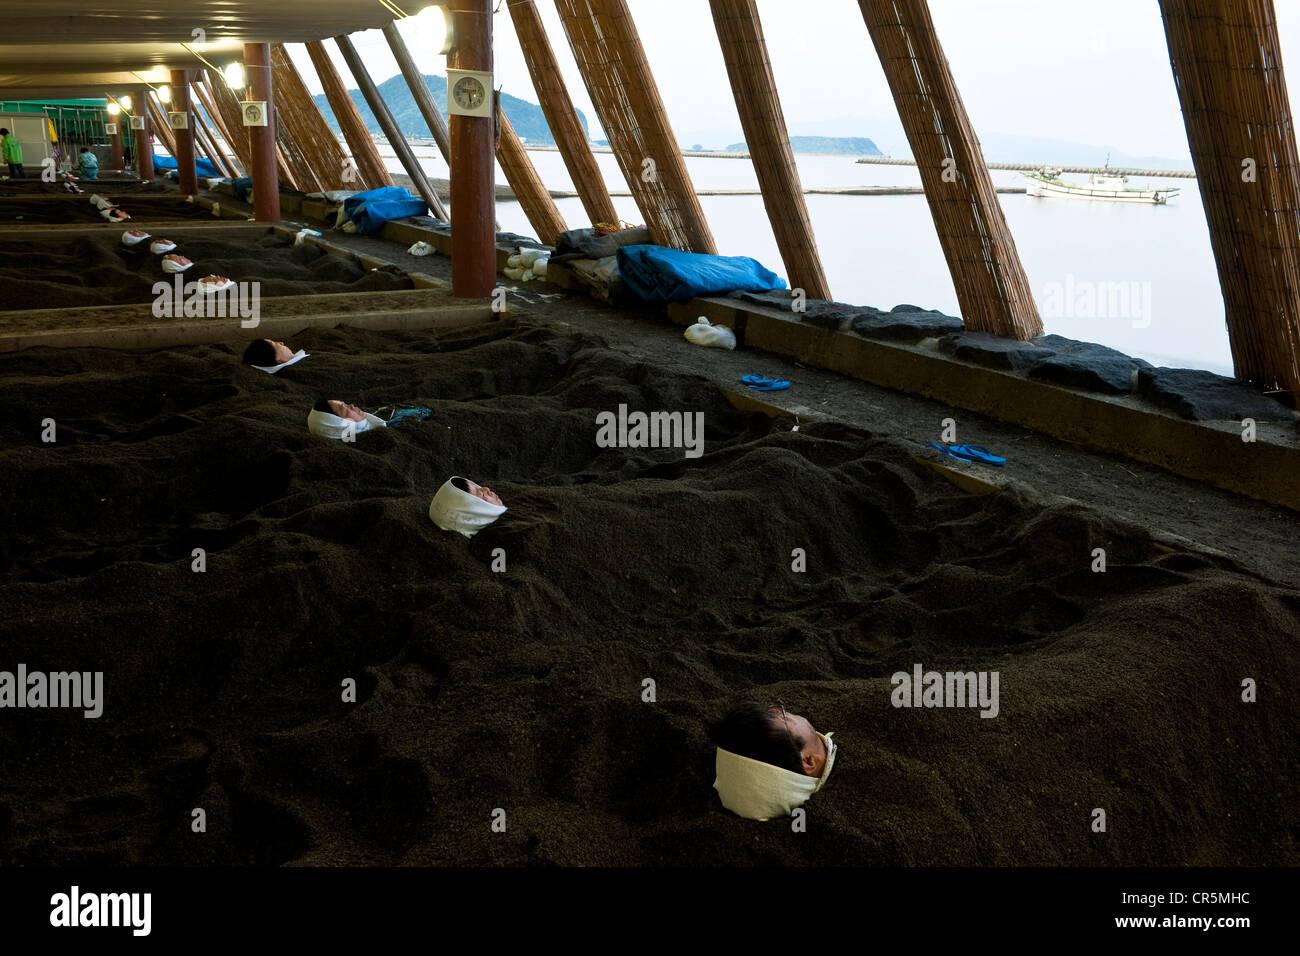 Japan, Kyushu Island, city of Ibusuki, bath of hot sand on the beach of the Ibusuki Sunamushi Onsen - Stock Image